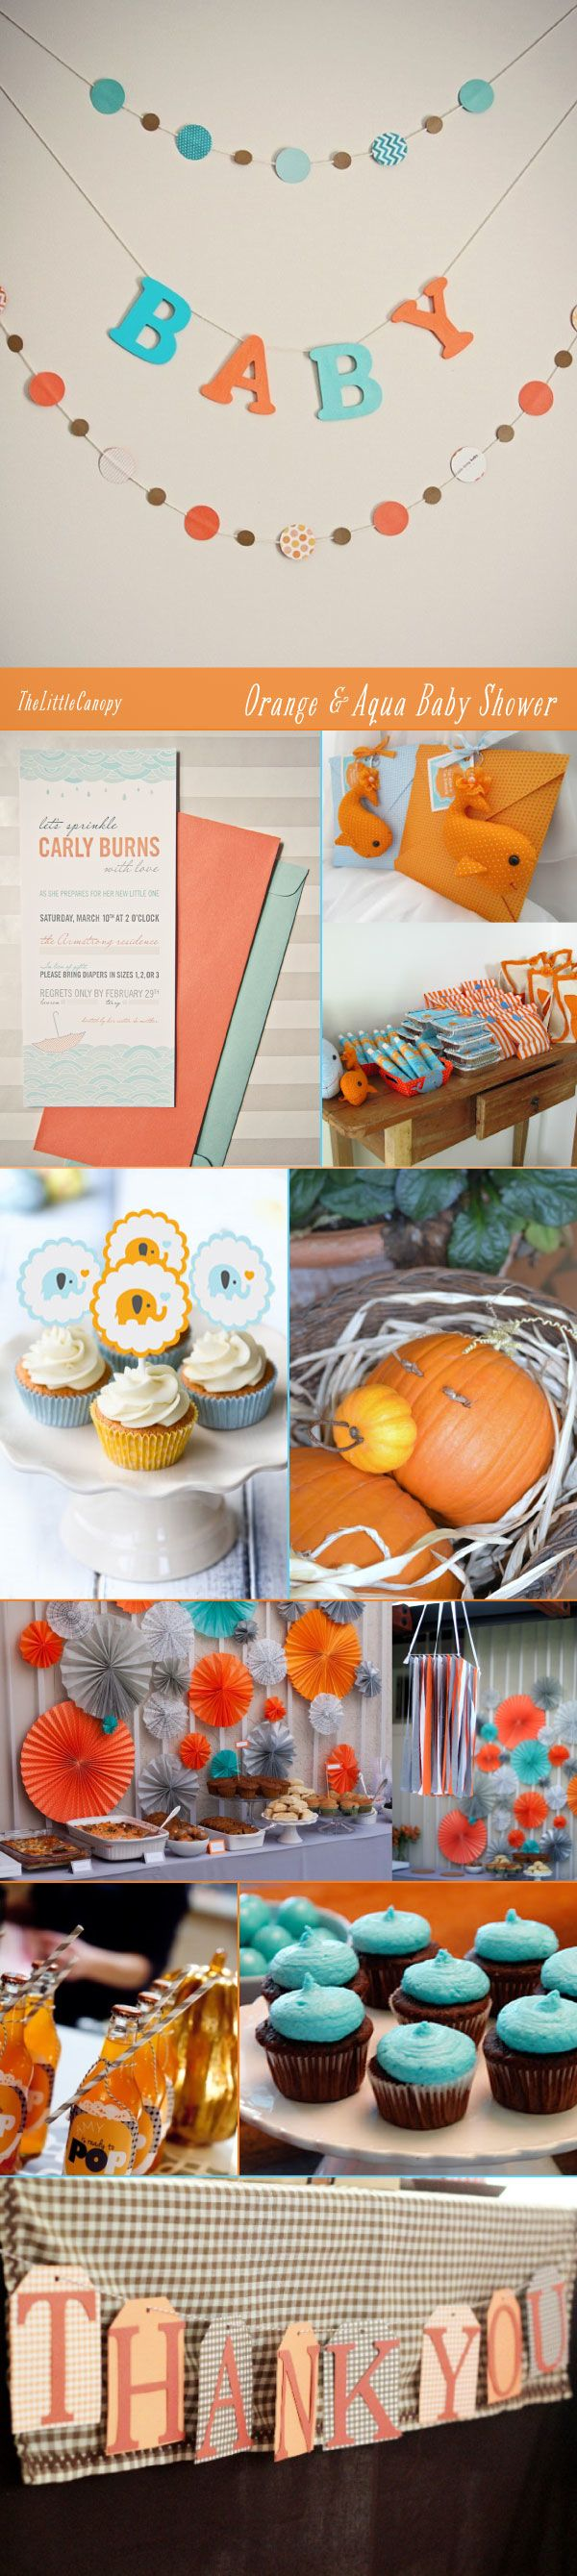 Orange and Aqua Fall Baby Shower Ideas - The Alison Show